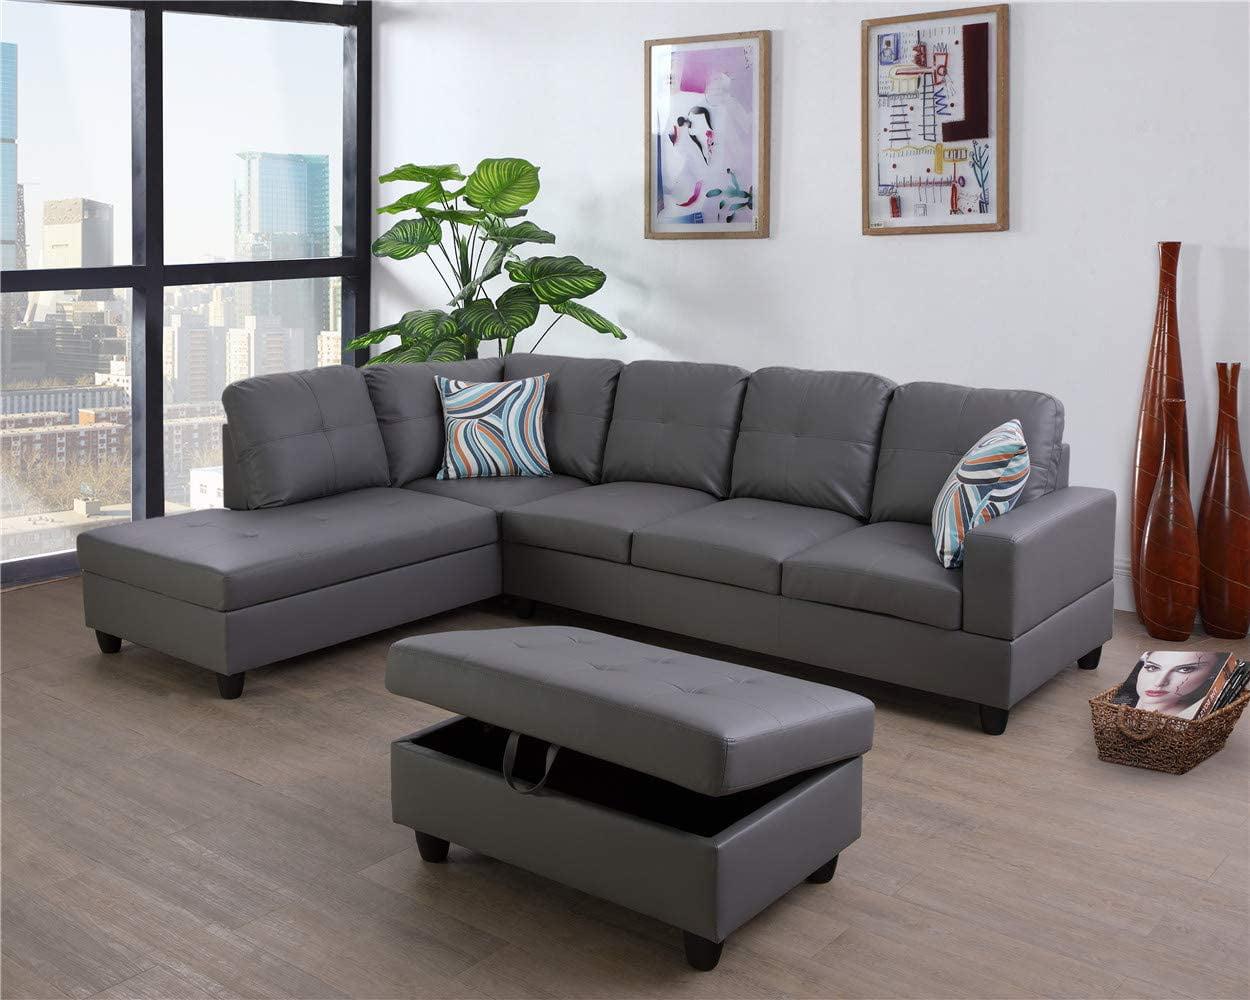 ainehome furniture sectional sofa set living room sofa